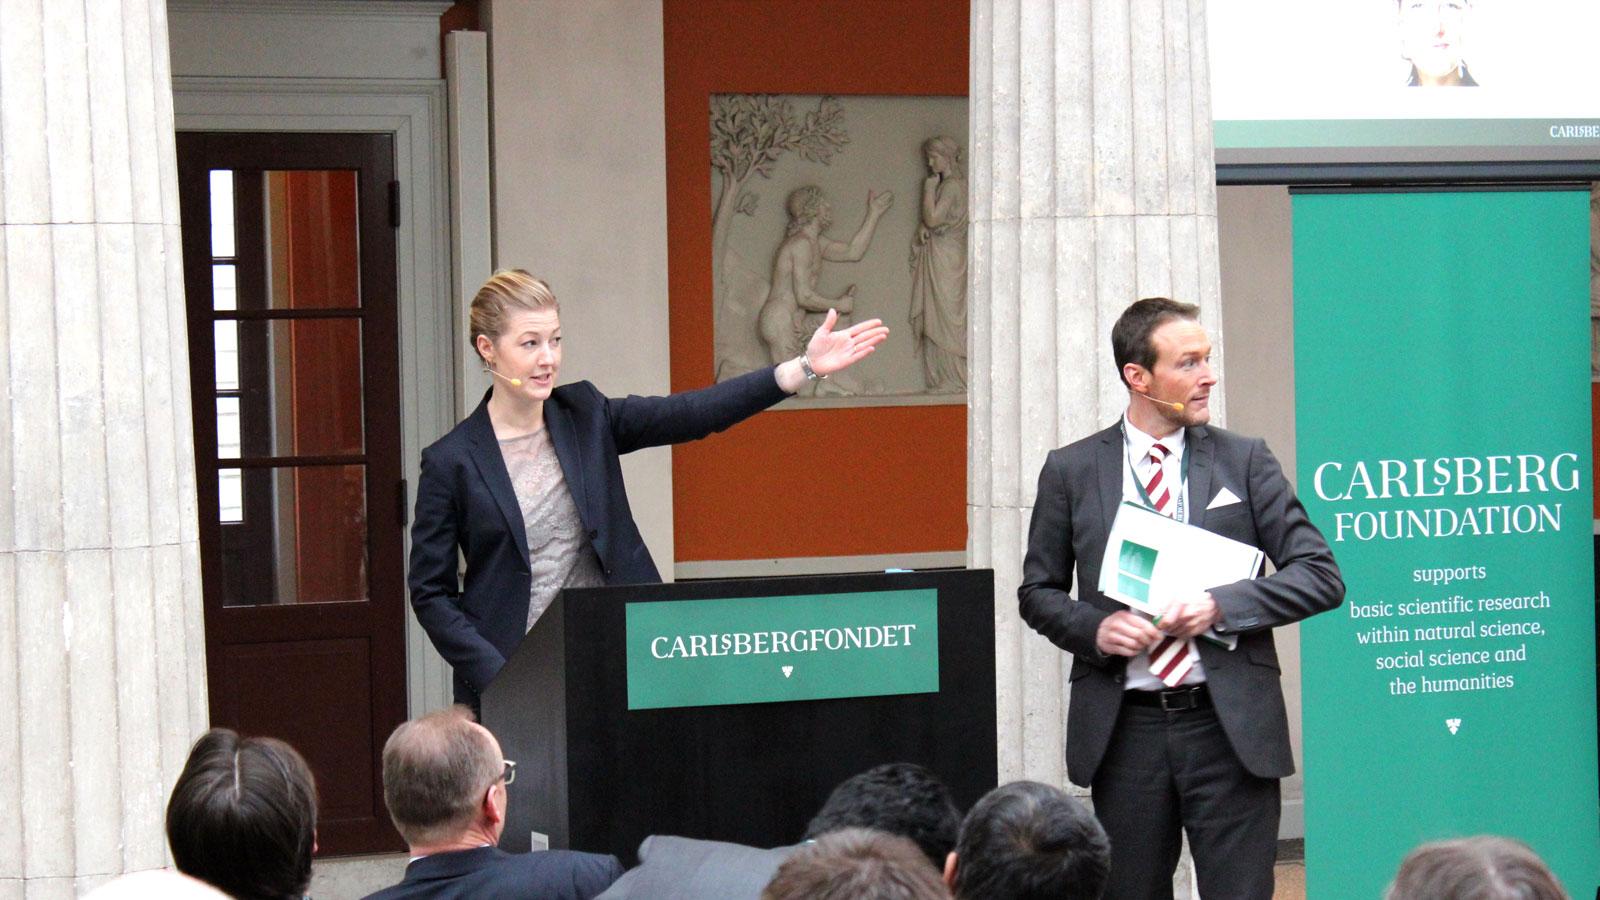 The Carlsberg Foundationu0027s Conferences